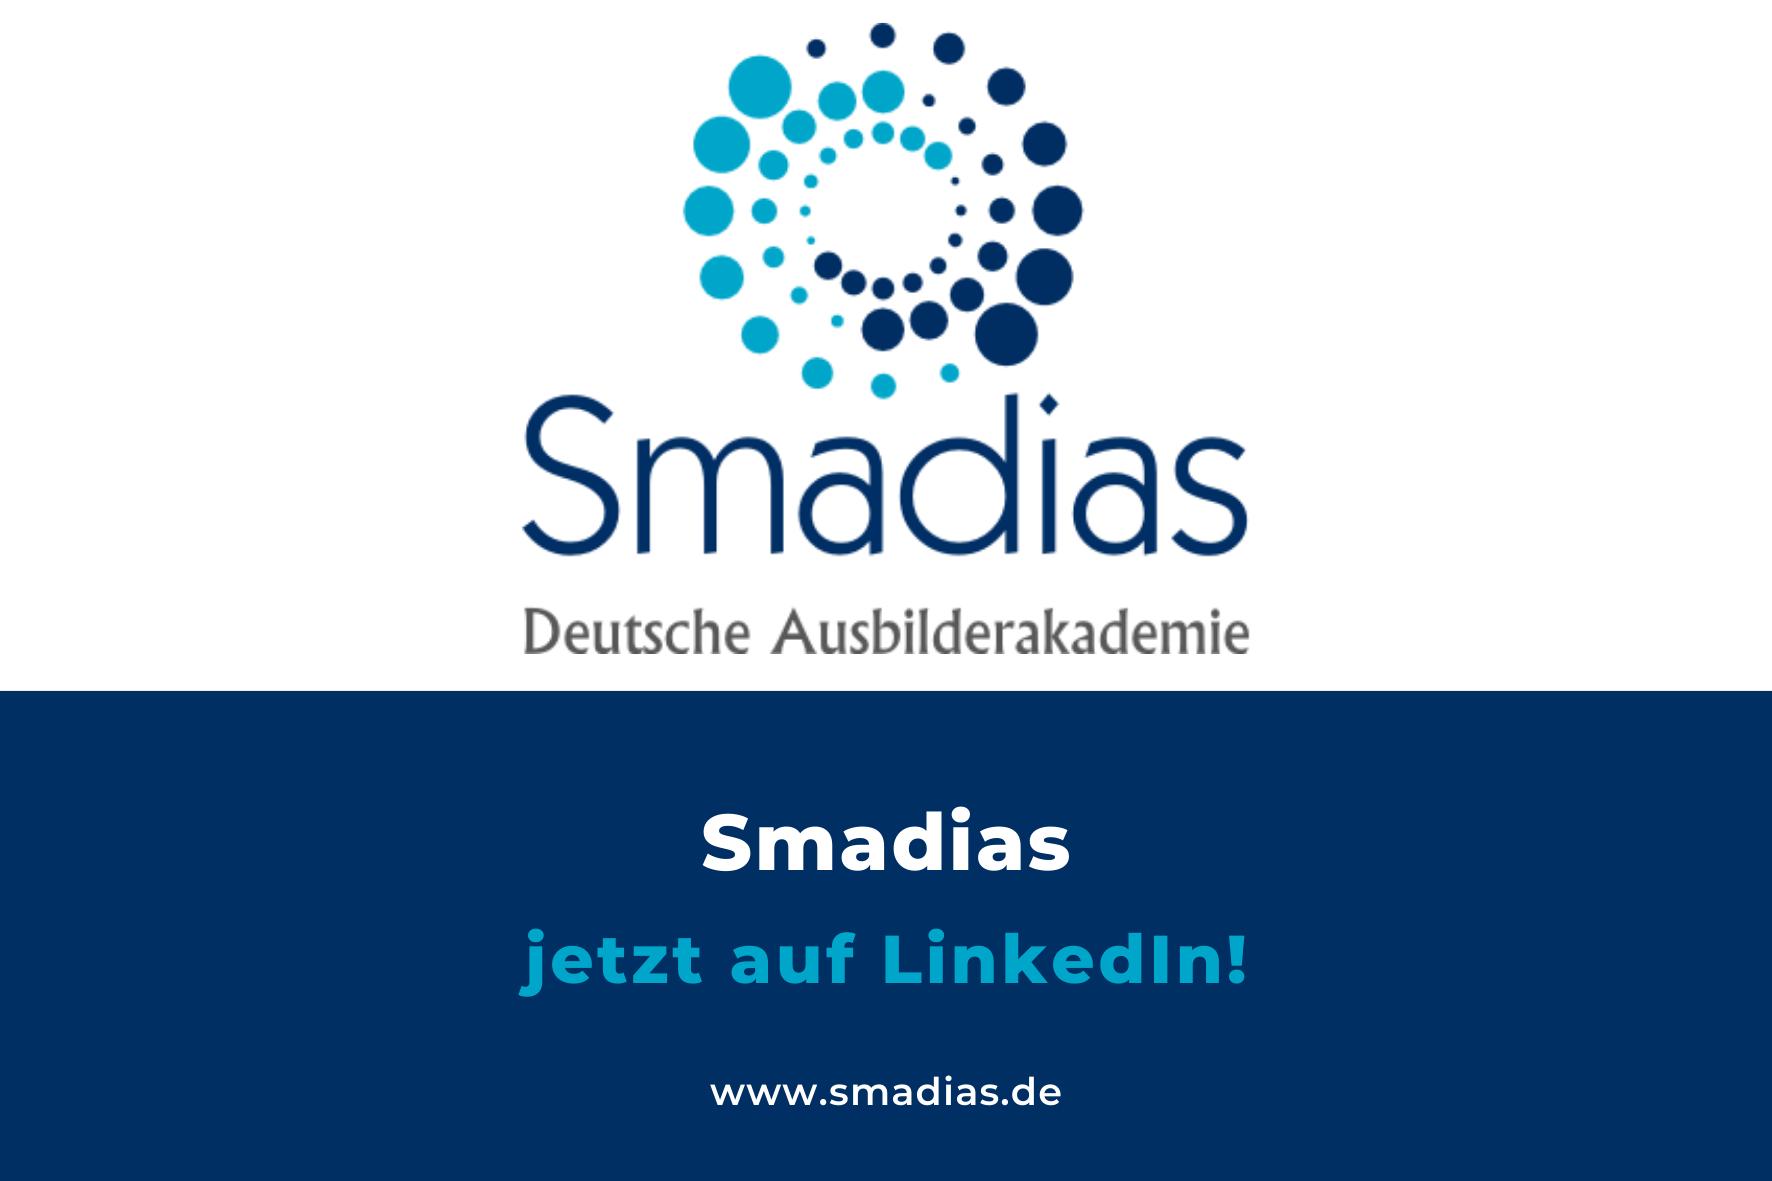 Smadias jetzt auch auf LinkedIn!